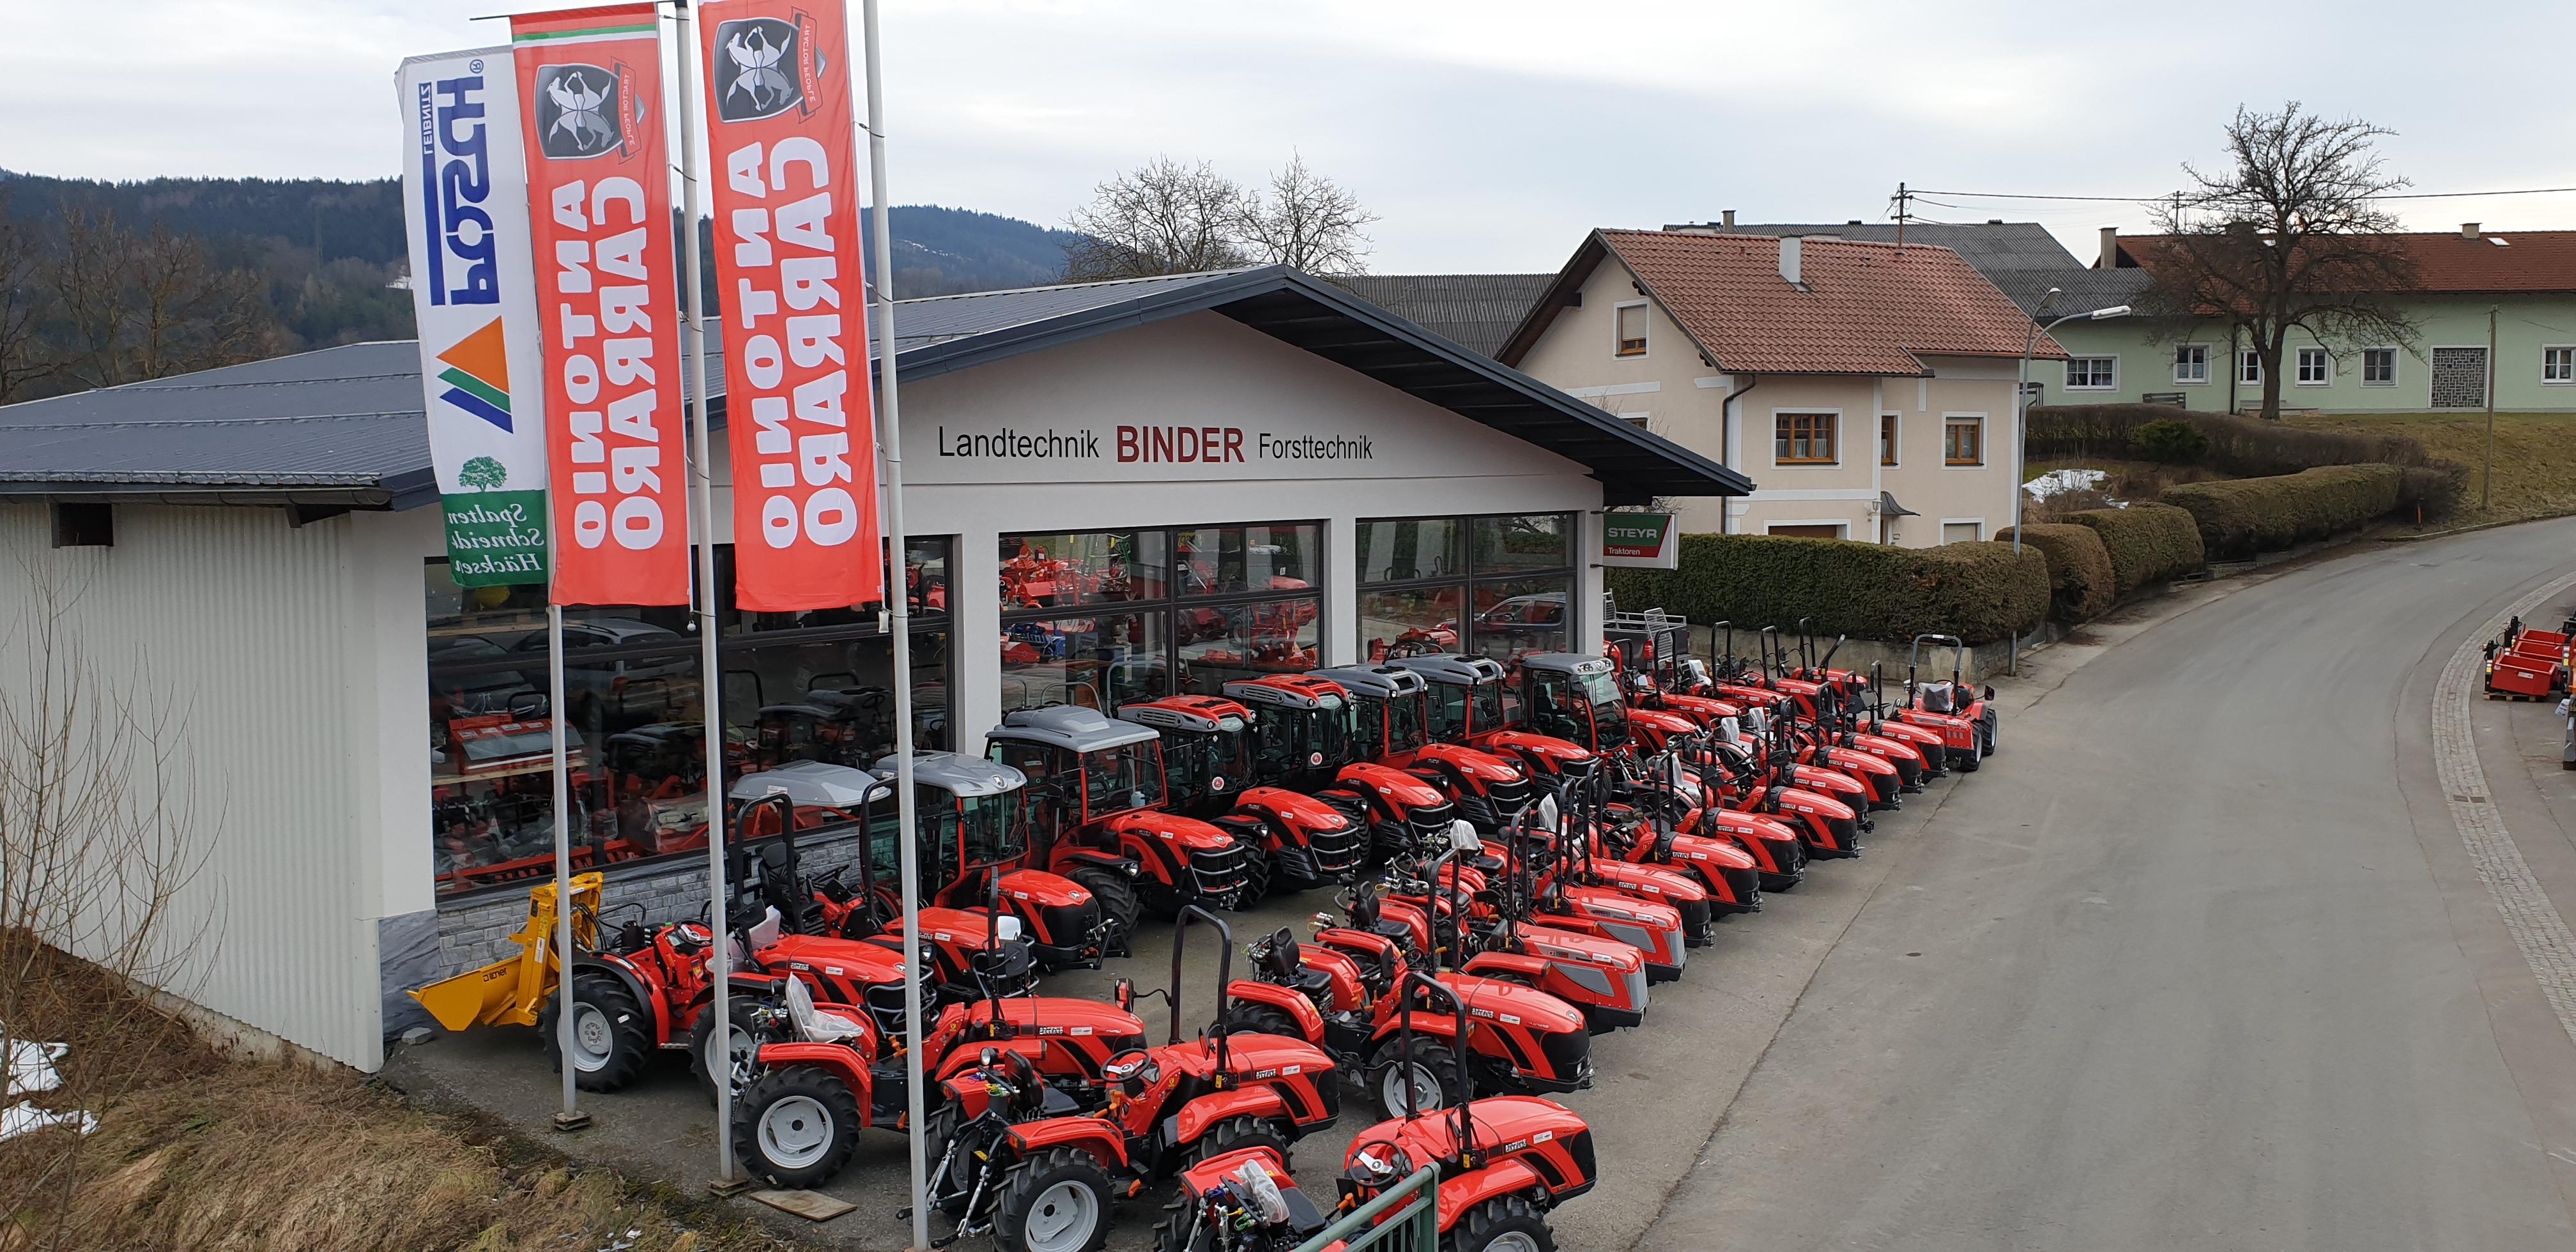 Beste Spielothek in Lehsdorf finden